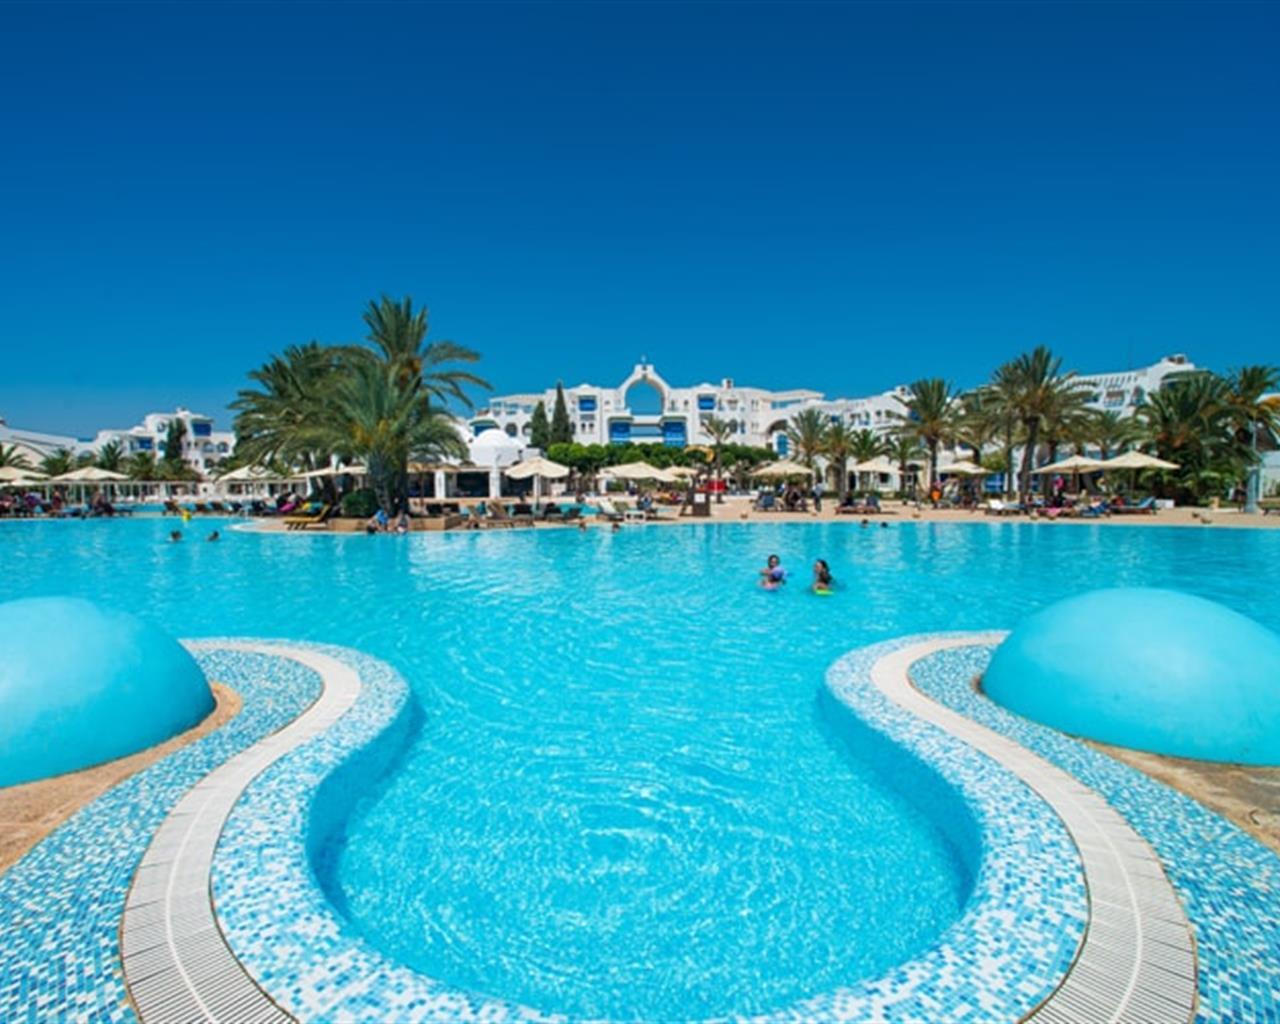 The Mirage Resort & Spa